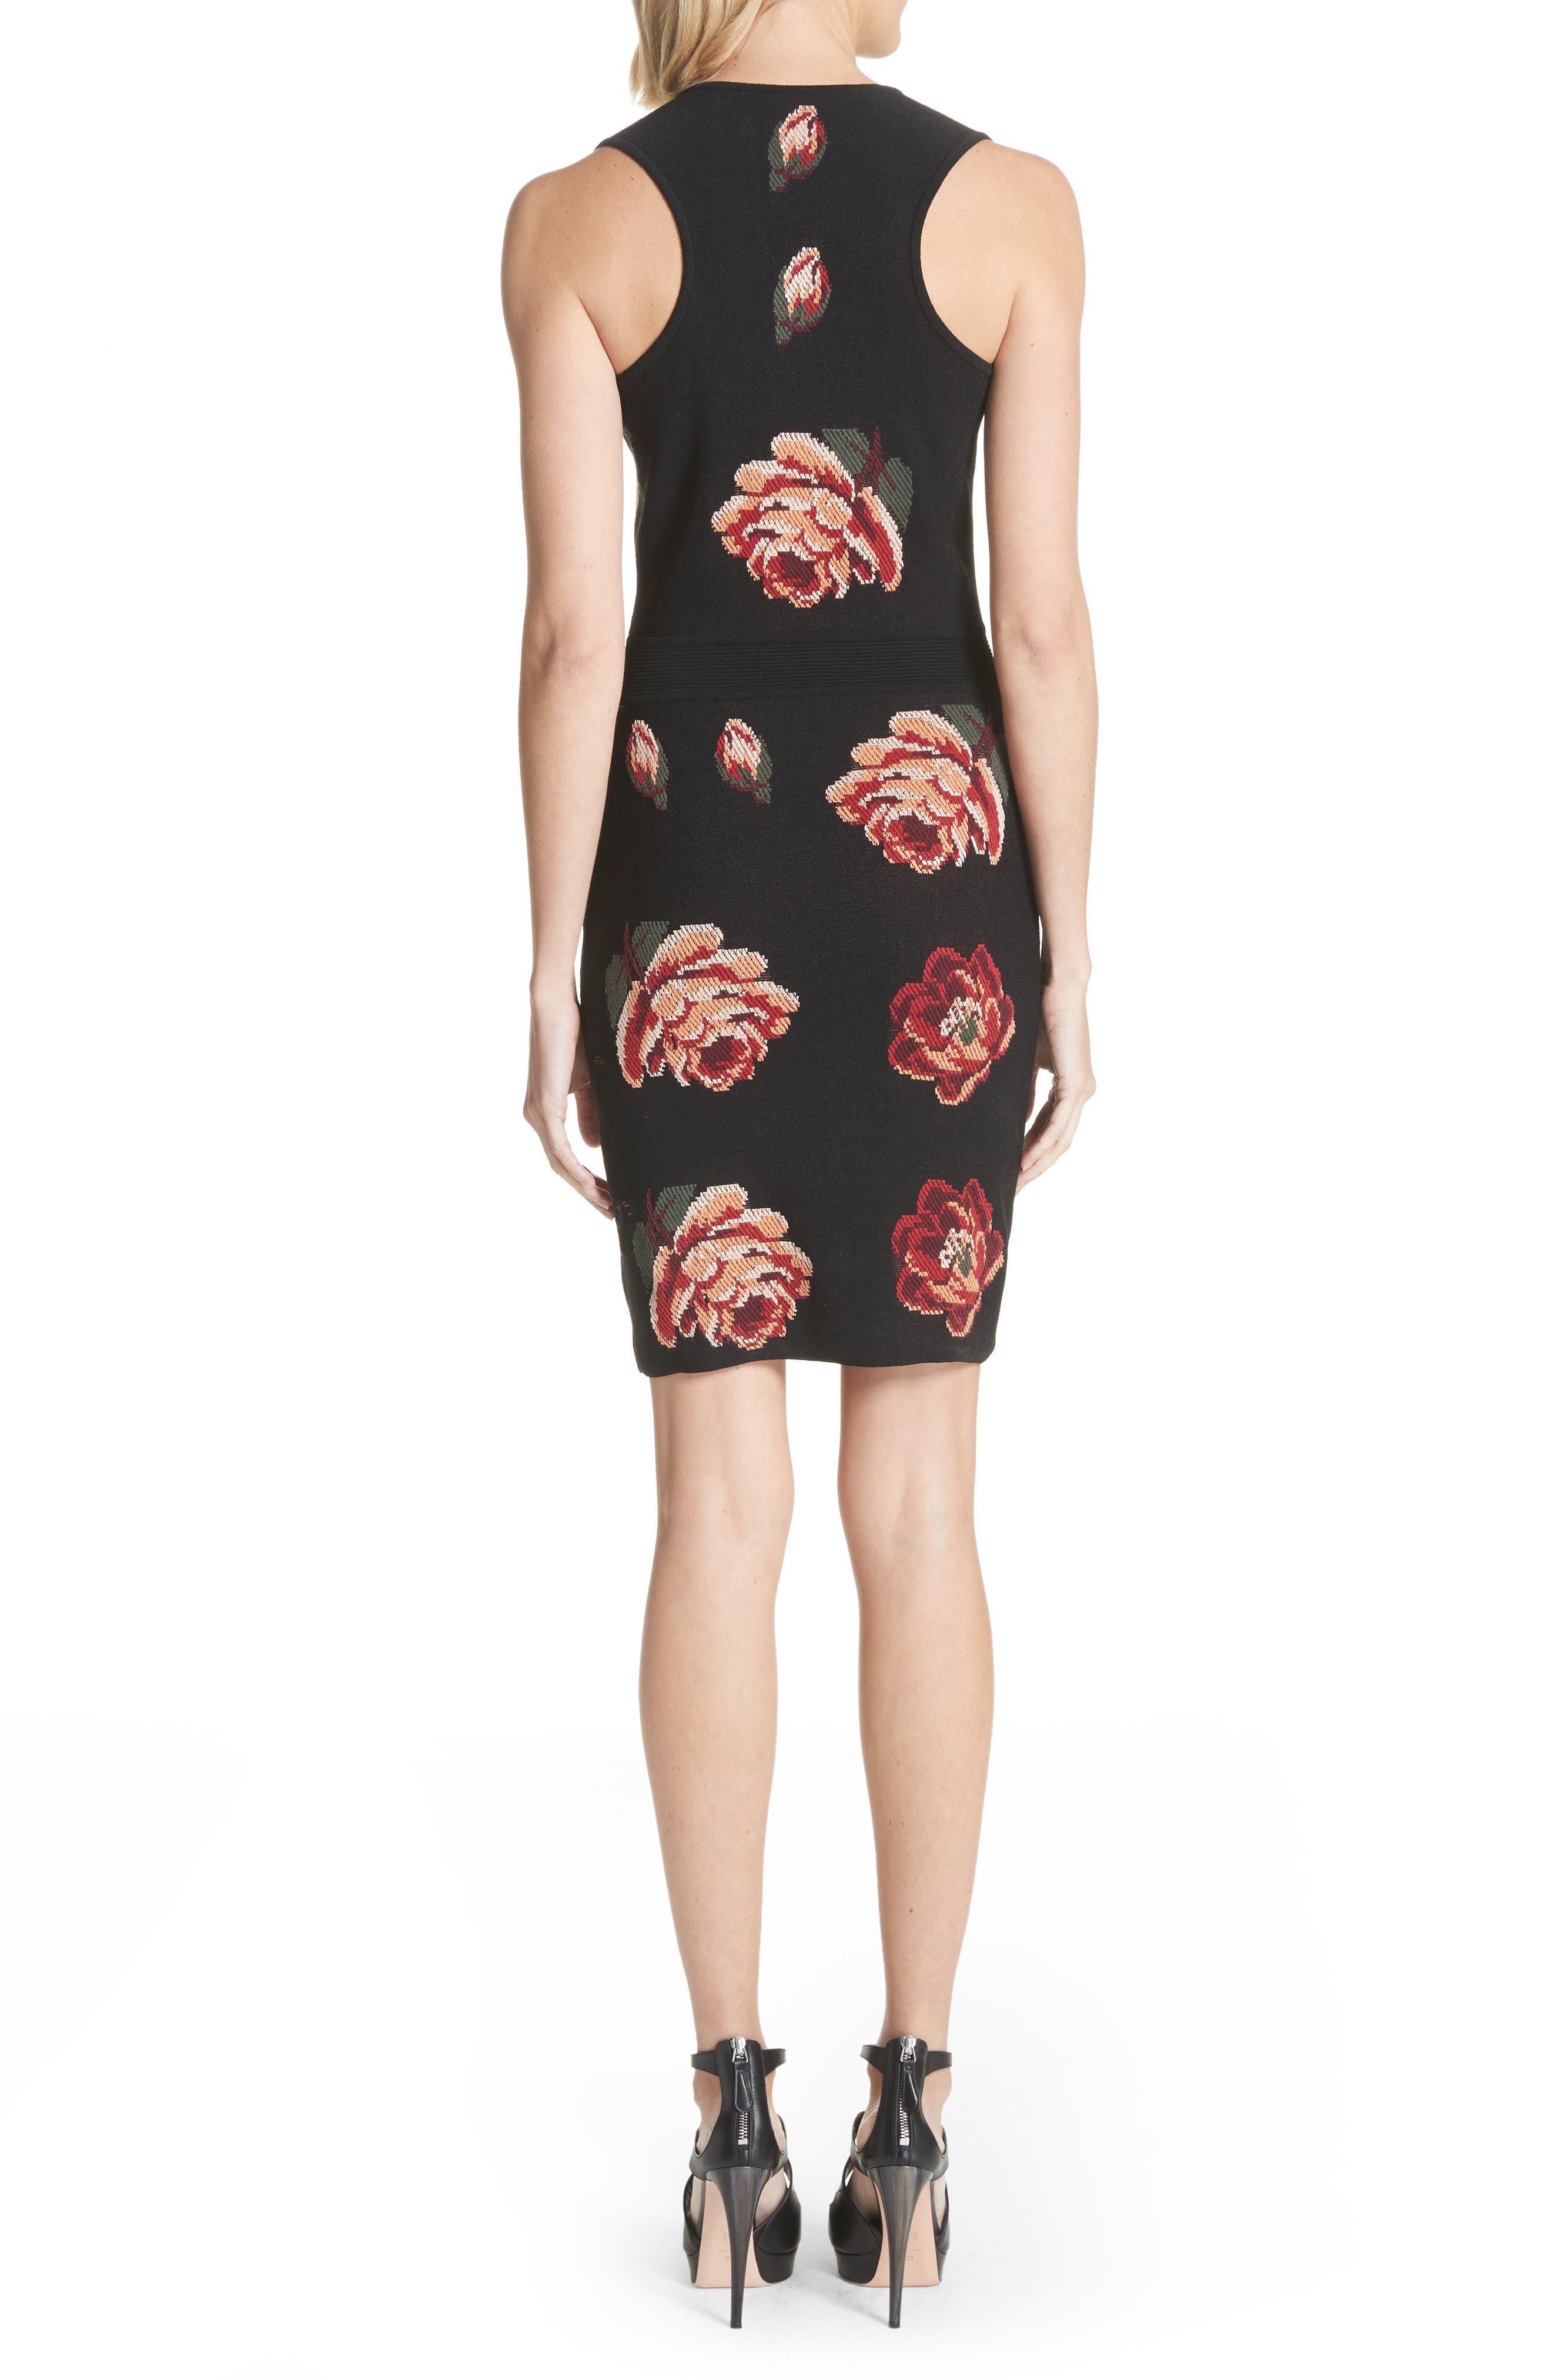 Intarsia Floral Print Dress,                             Alternate thumbnail 2, color,                             Black/ Red/ Green